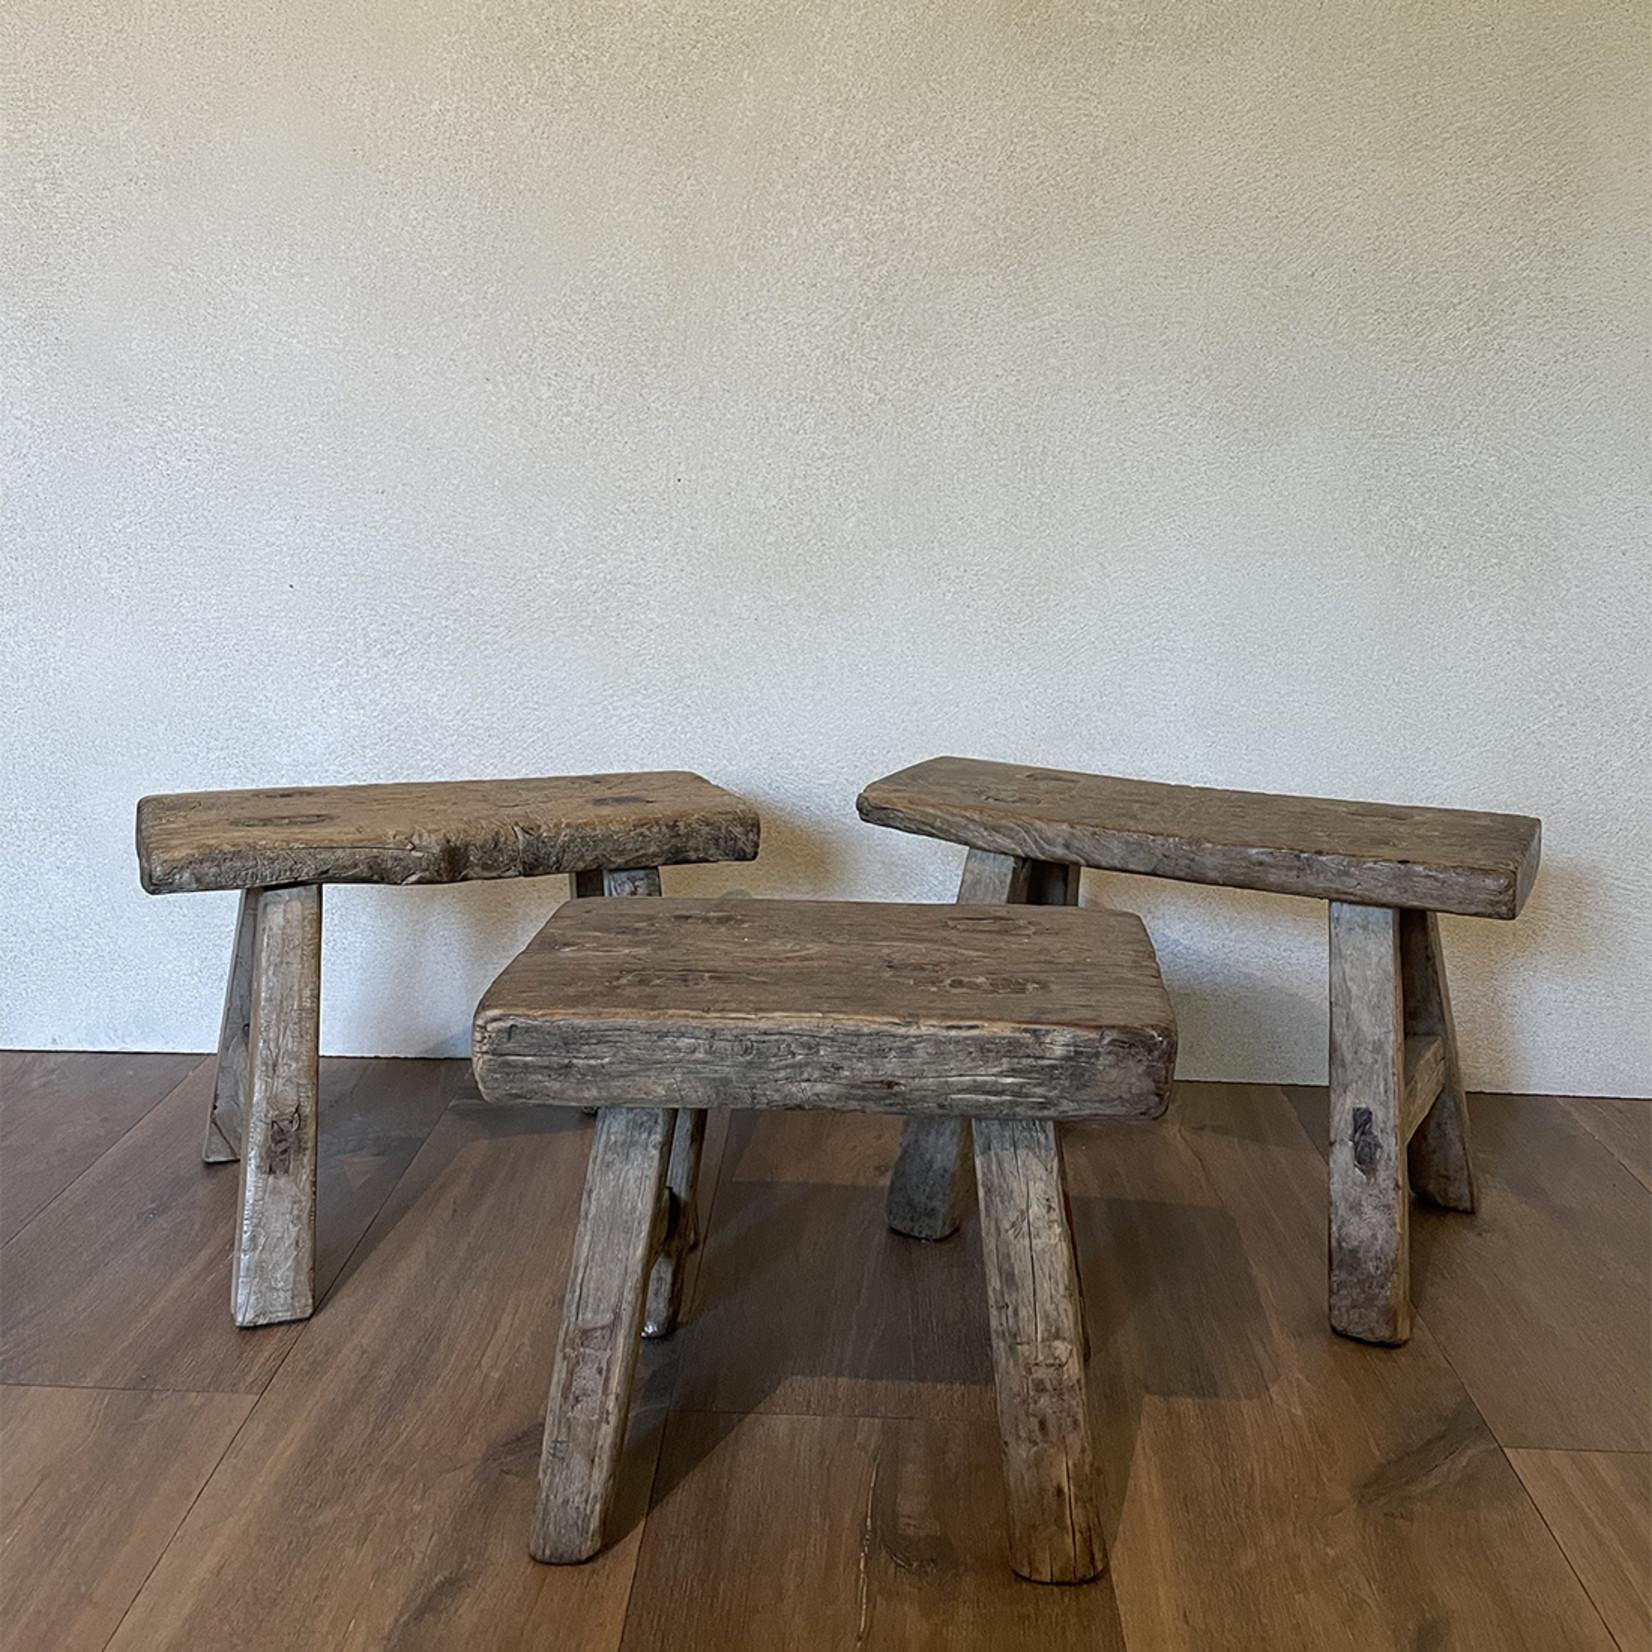 Mini stool